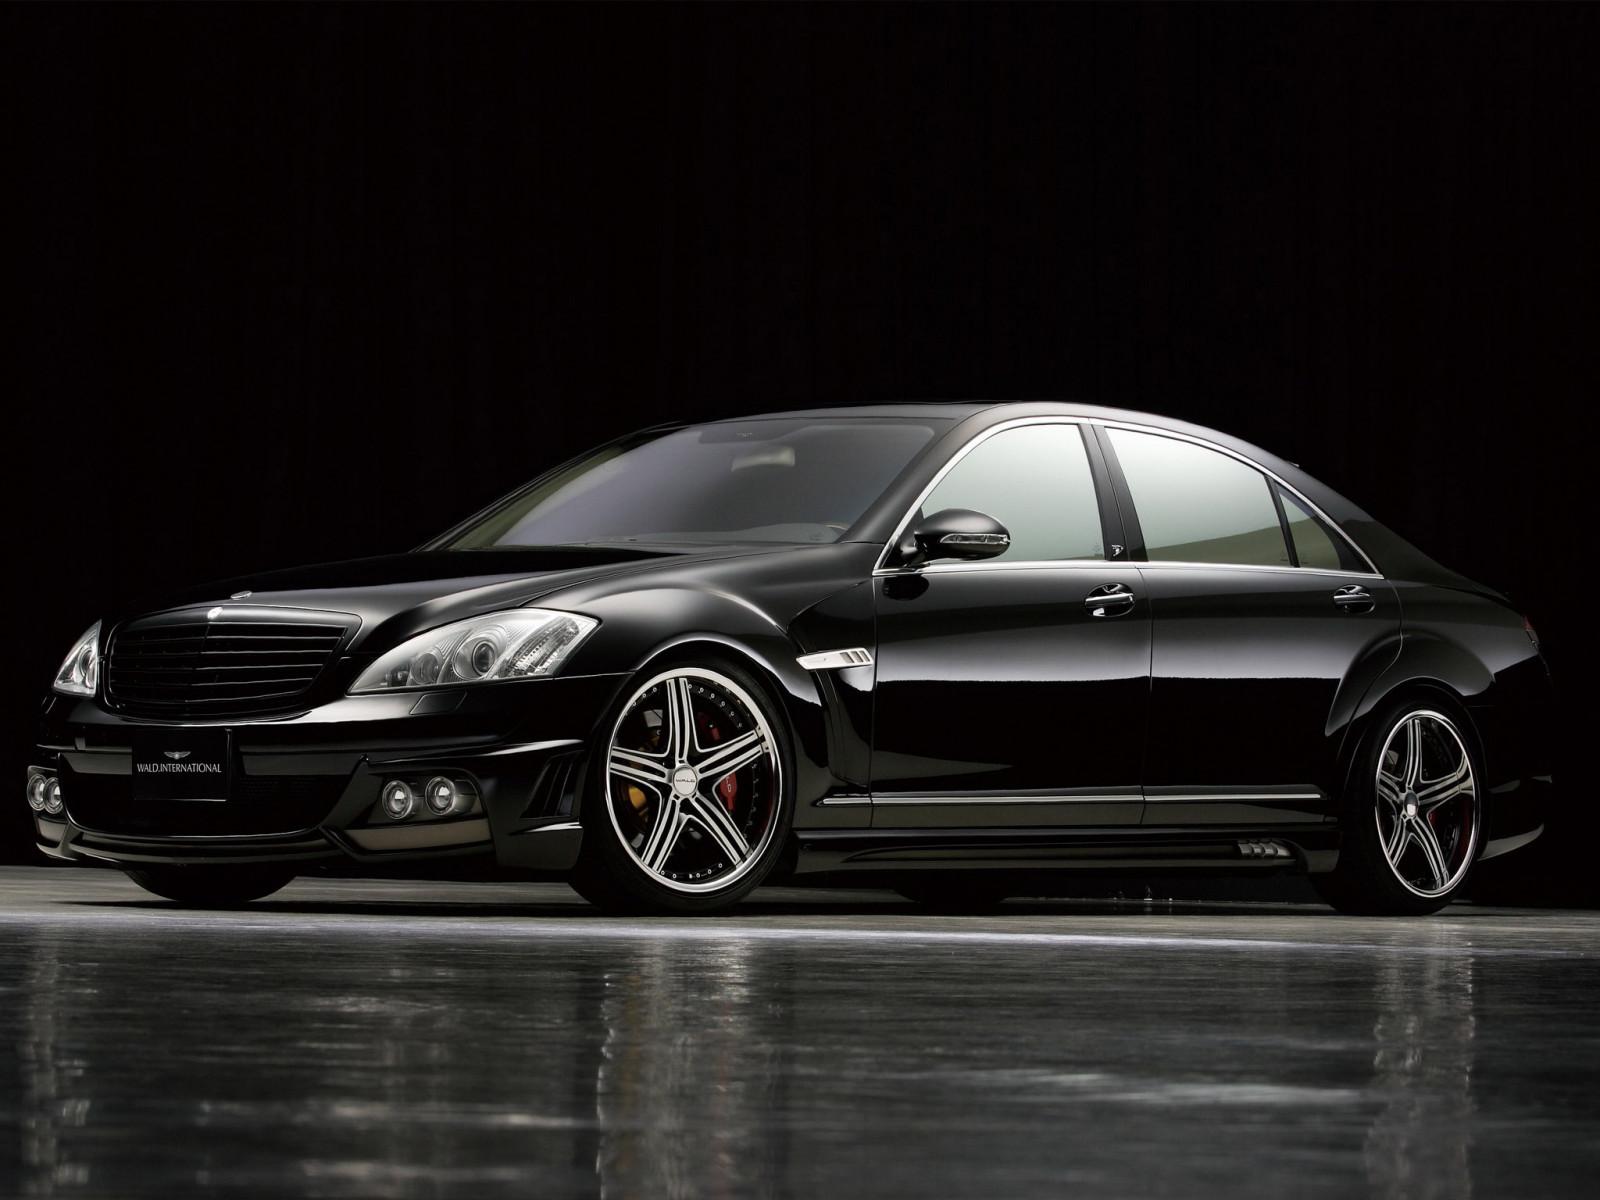 16 Luxury Pubg Wallpaper Iphone 6: Wallpaper : Mercedes Benz, Sports Car, Sedan, Netcarshow